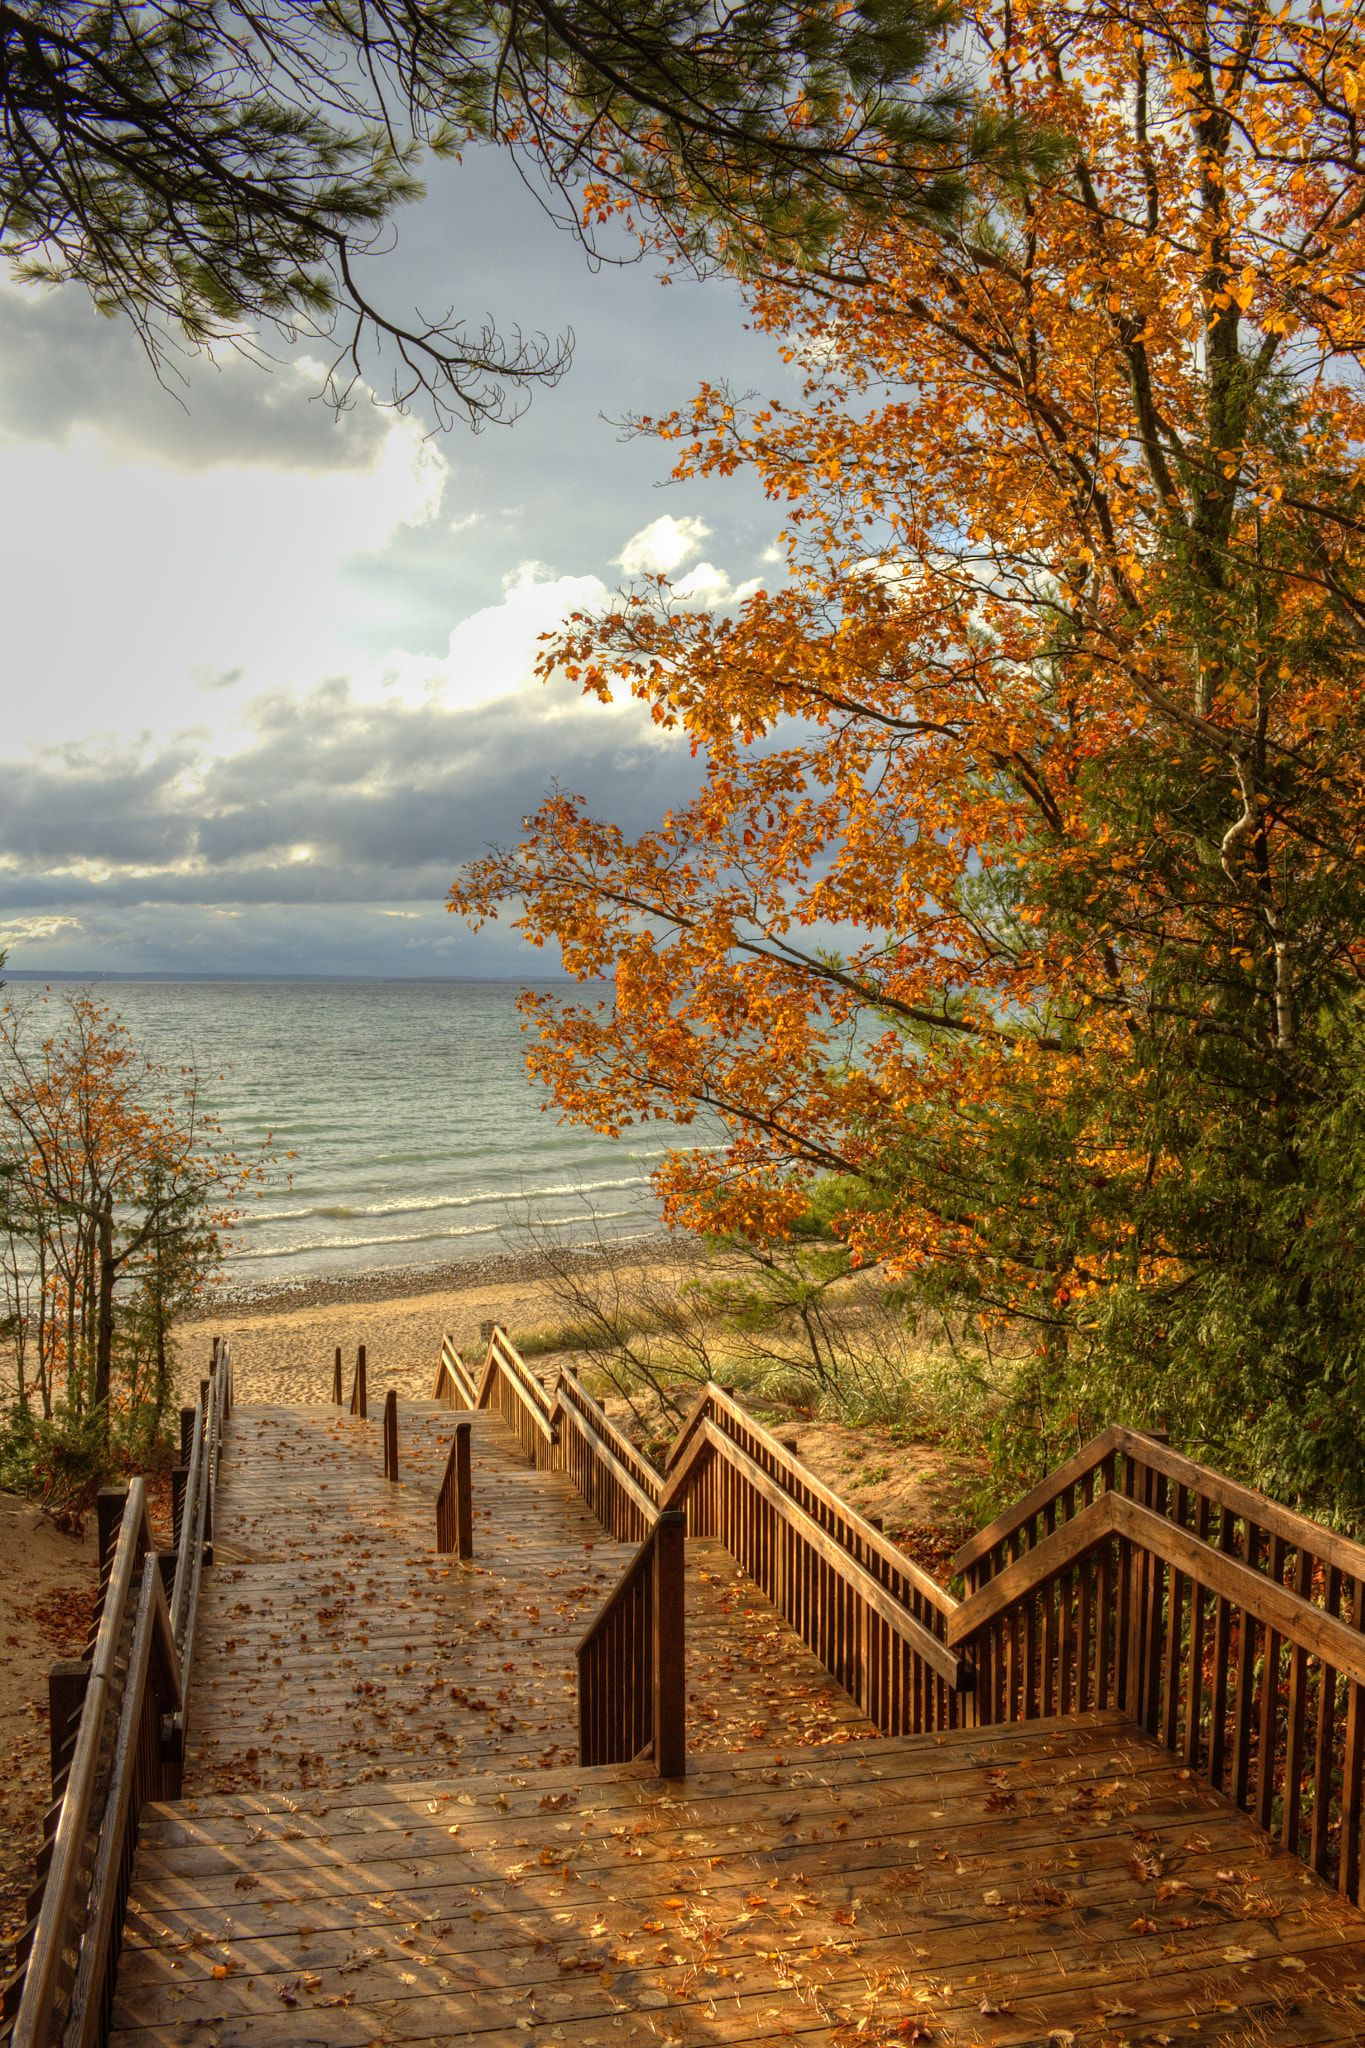 Barnes Park - Lake Michigan - Antrim County, Michigan, USA ...